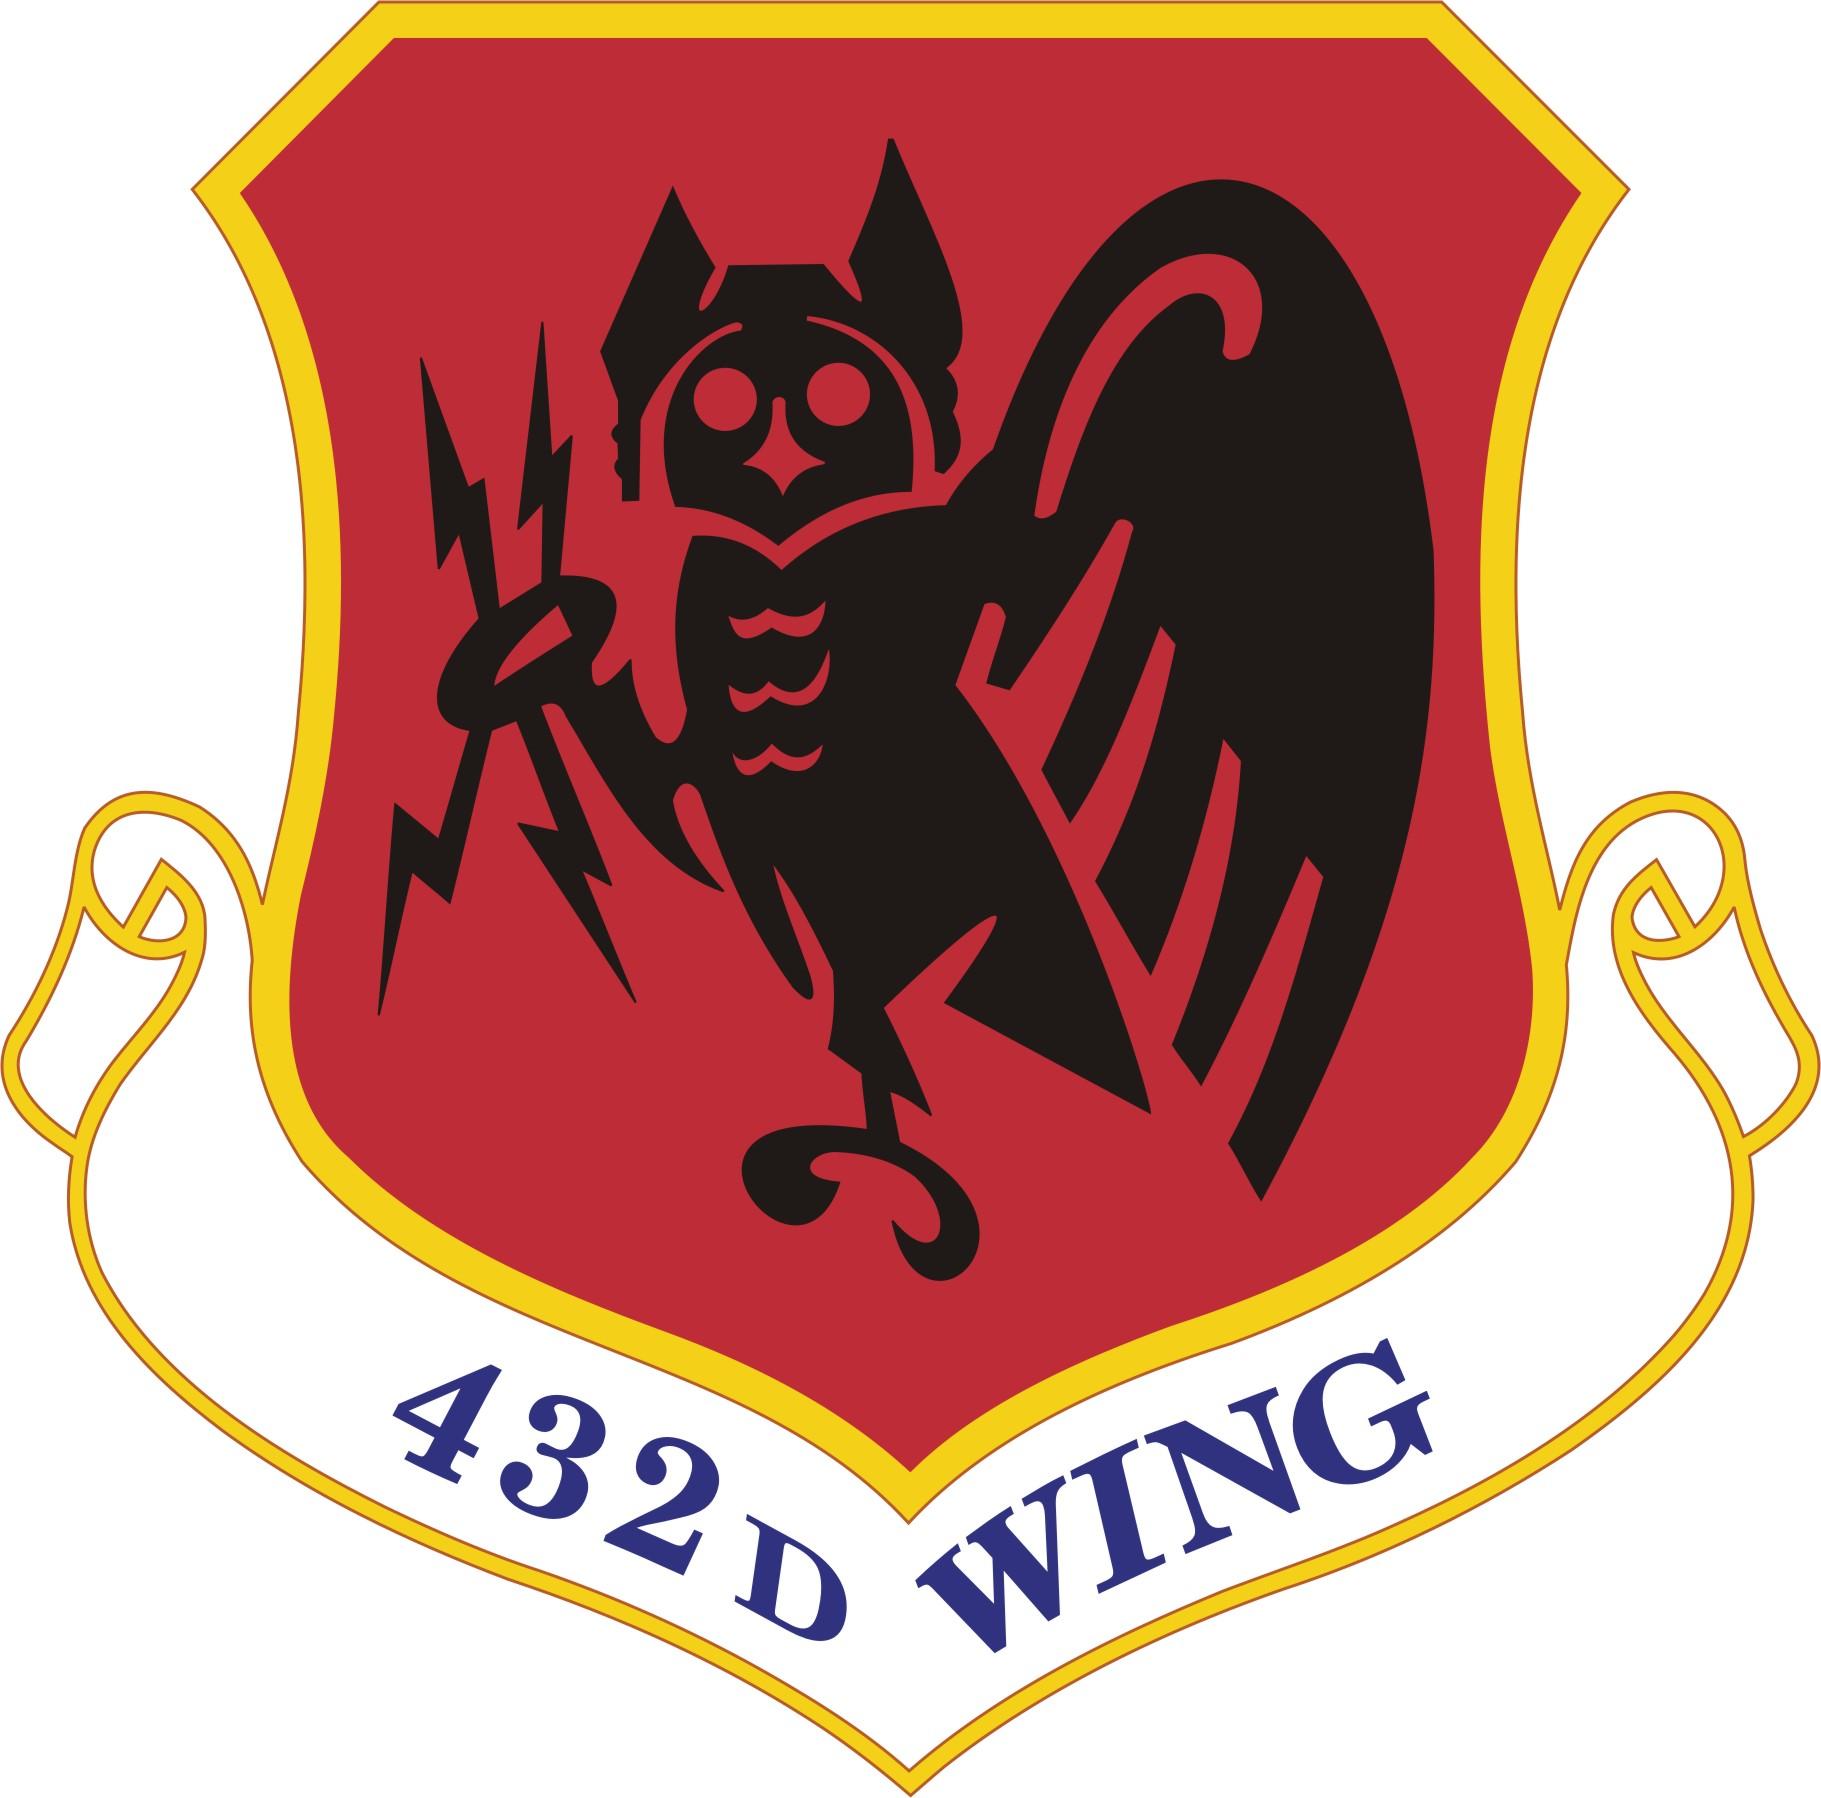 432nd Wing shield